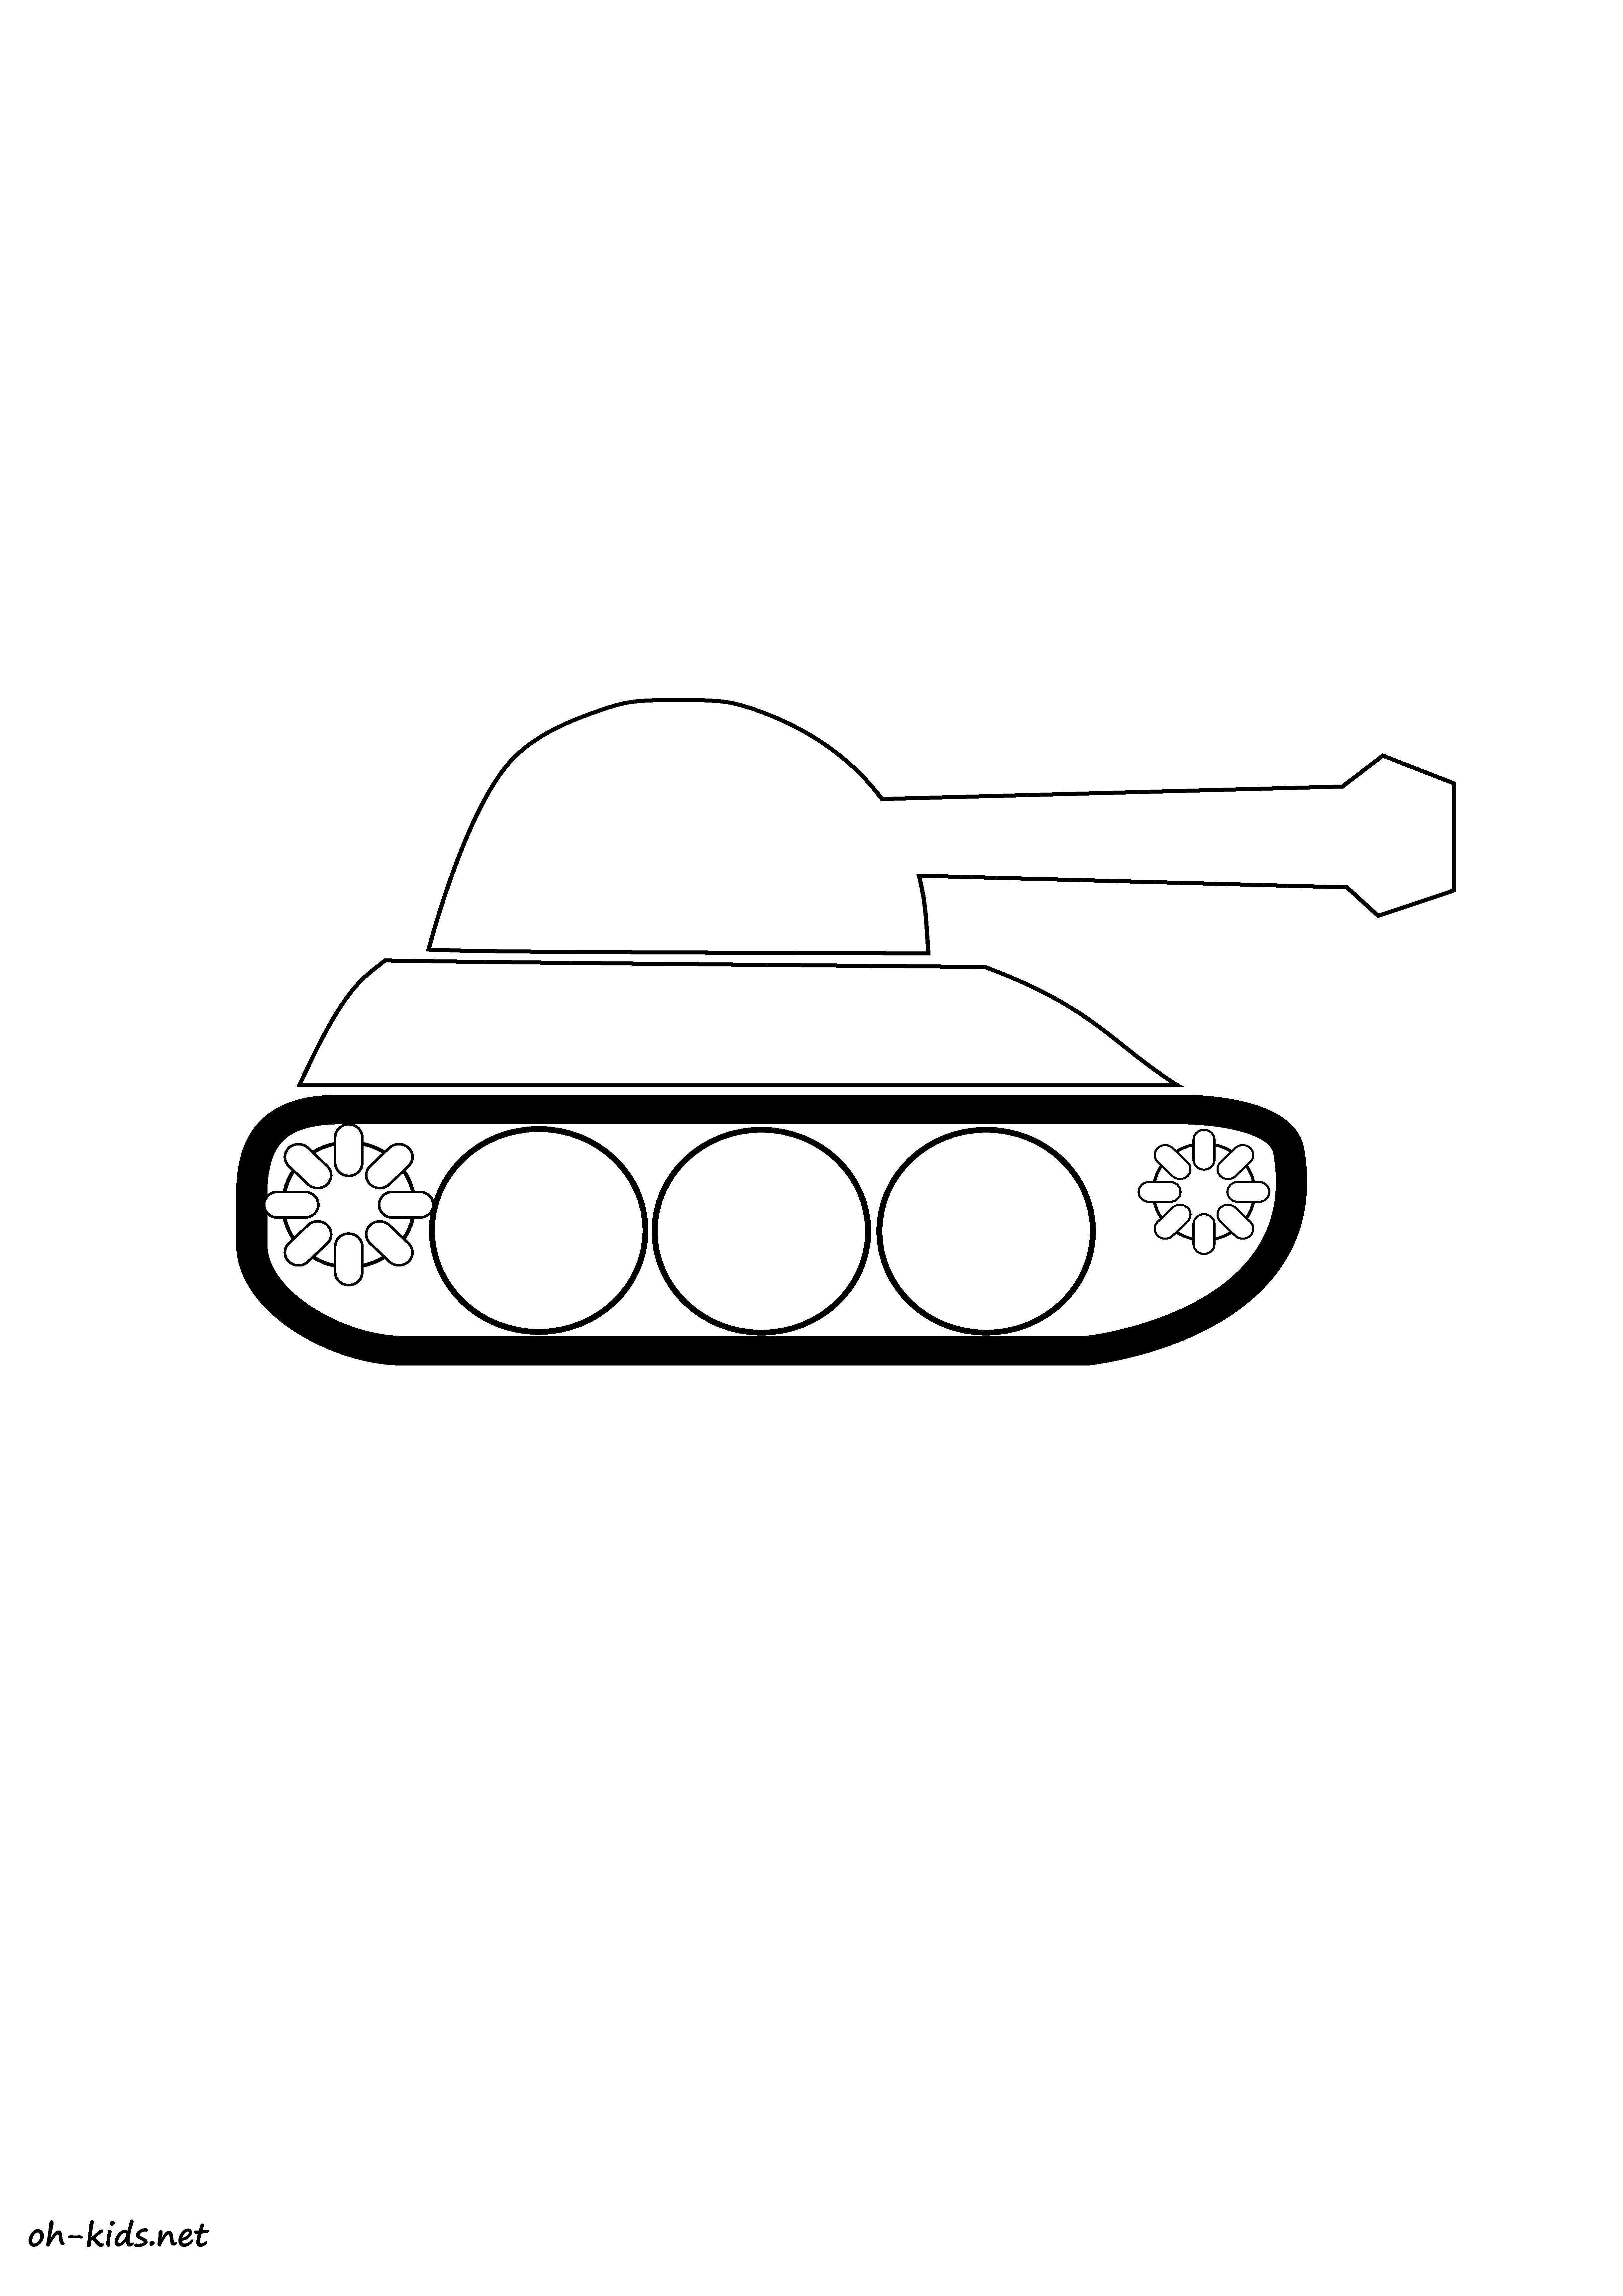 Dessin 304 coloriage tank imprimer oh - Coloriage de tank ...